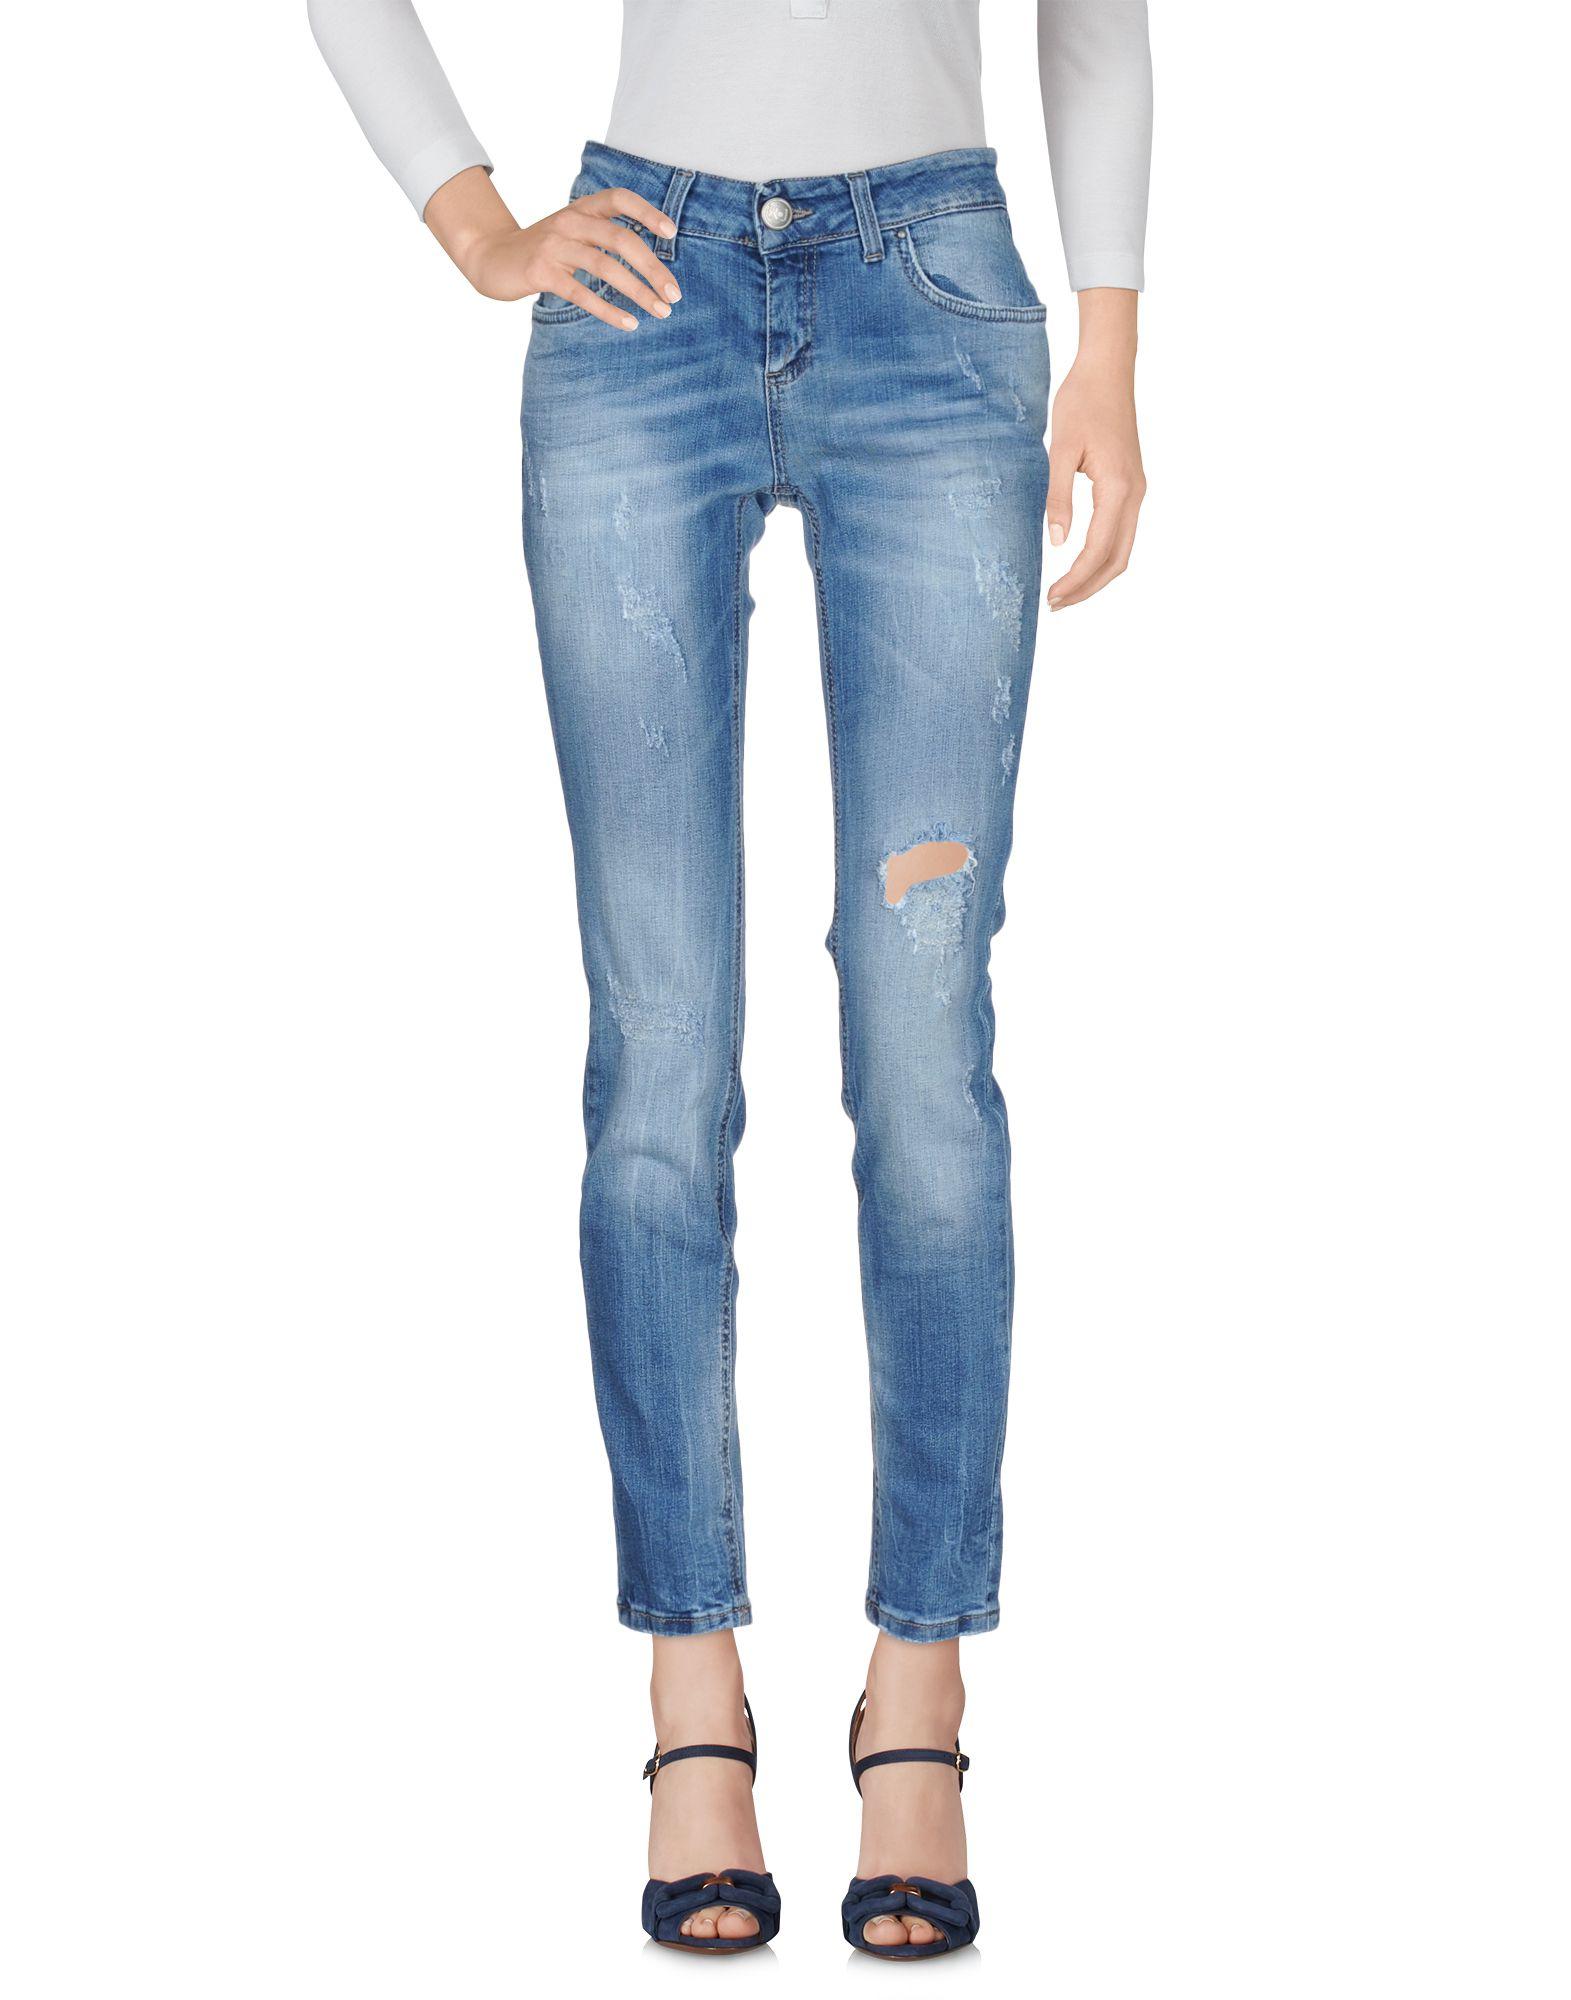 R* JEANS by RINASCIMENTO Джинсовые брюки r jeans by rinascimento брюки капри